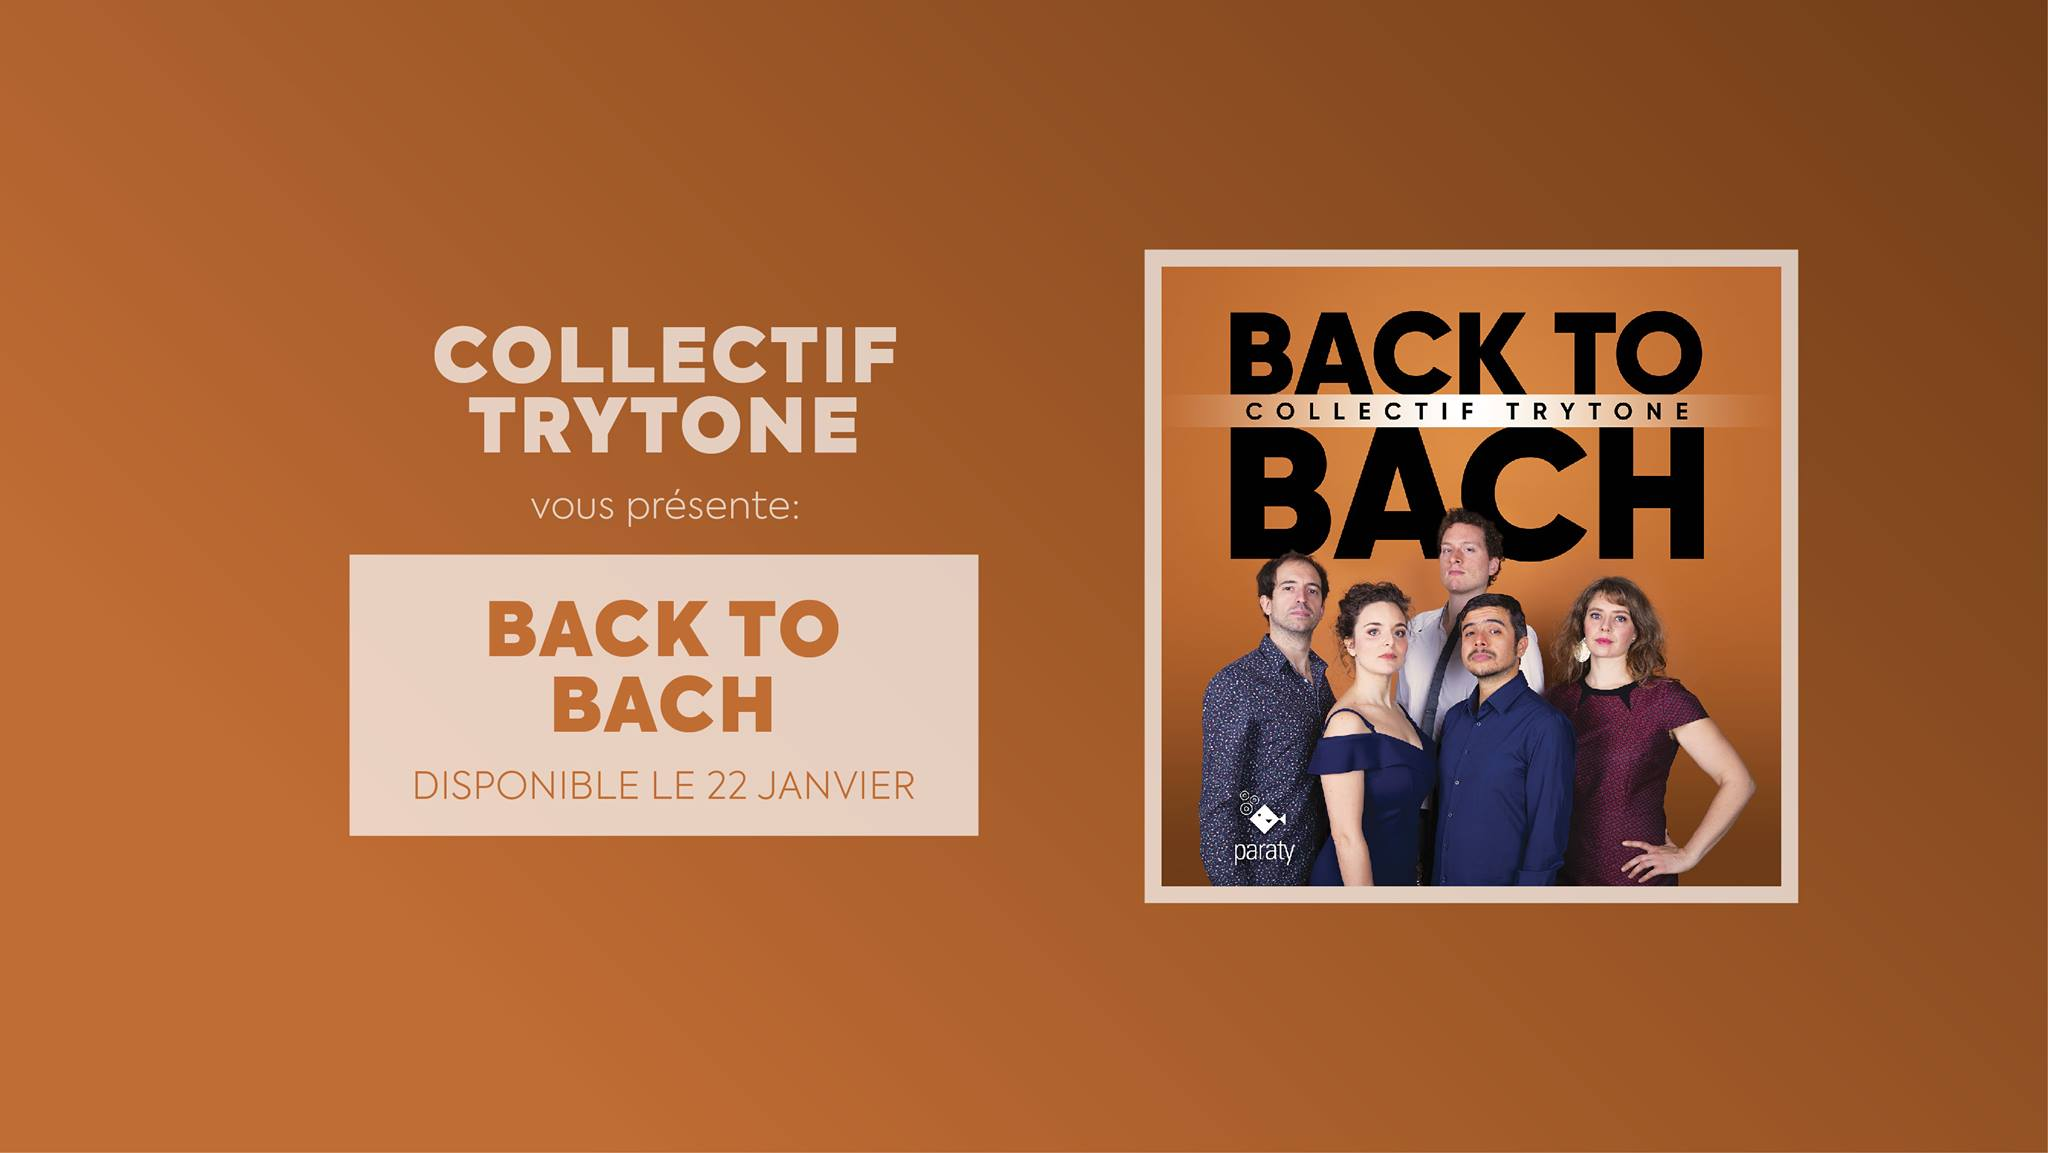 C trytone